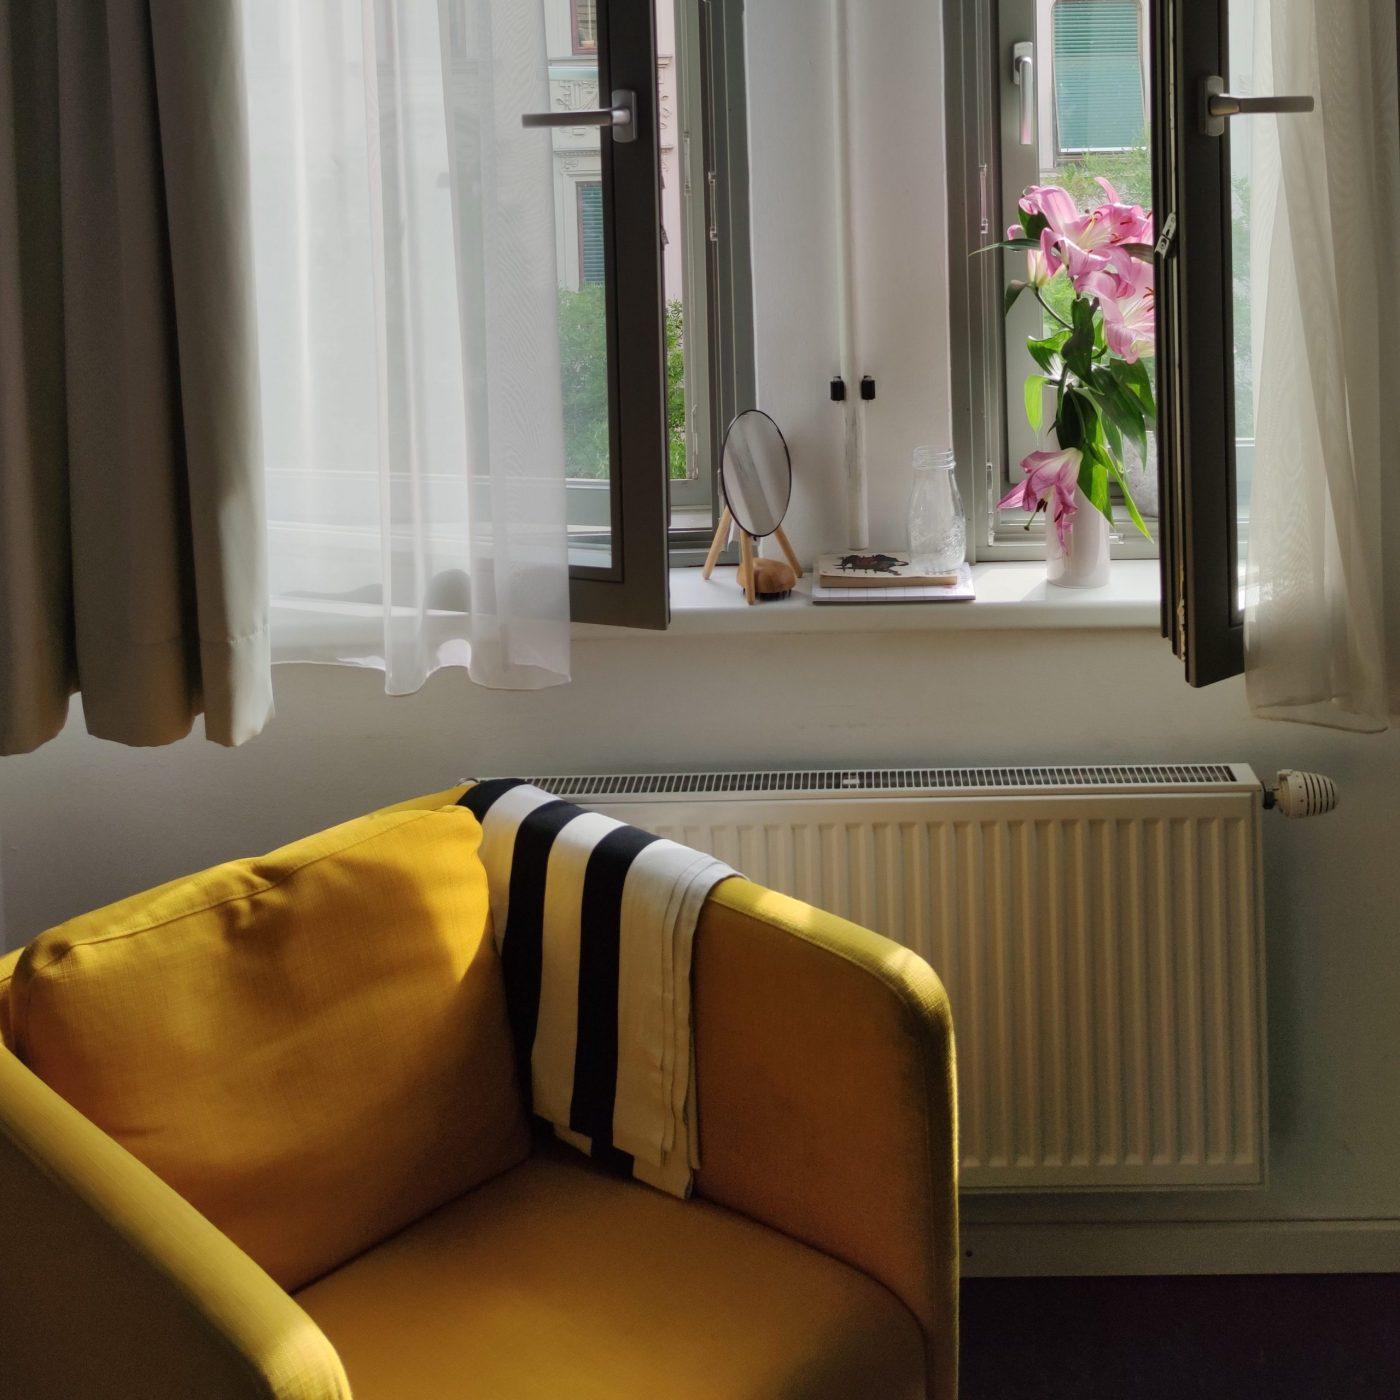 Gelber Sessel, geoeffnets Fenster